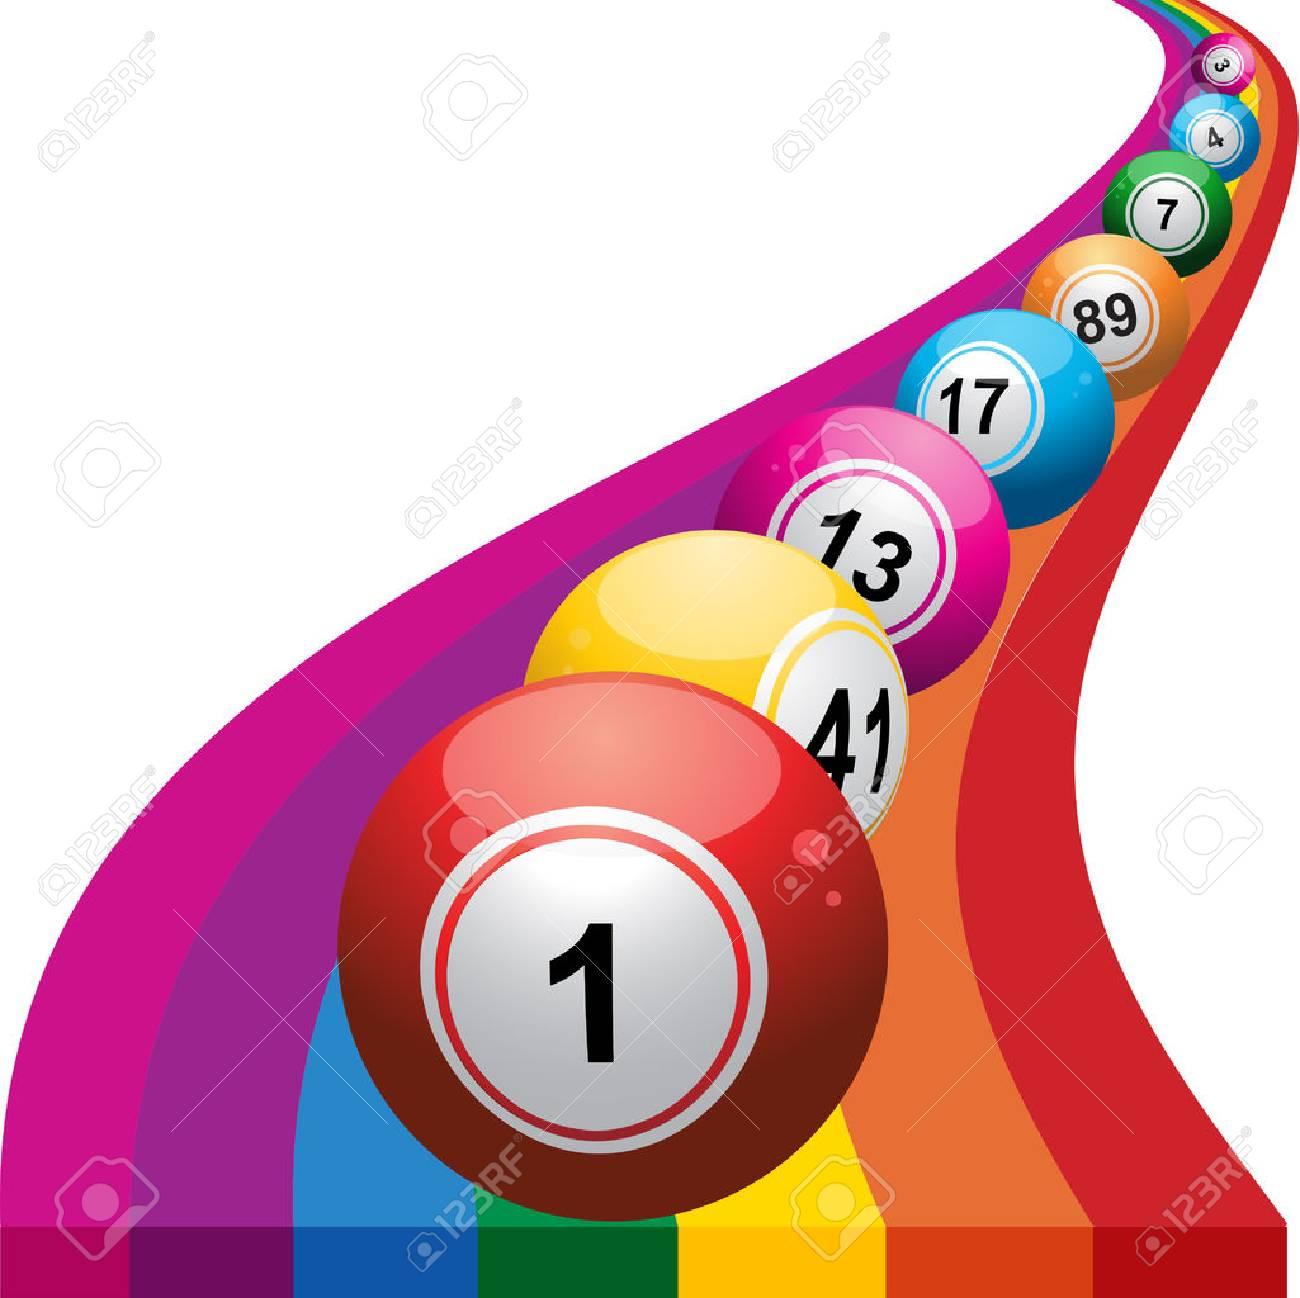 Bingo Balls Rolling on a Colorfull Raimbow.